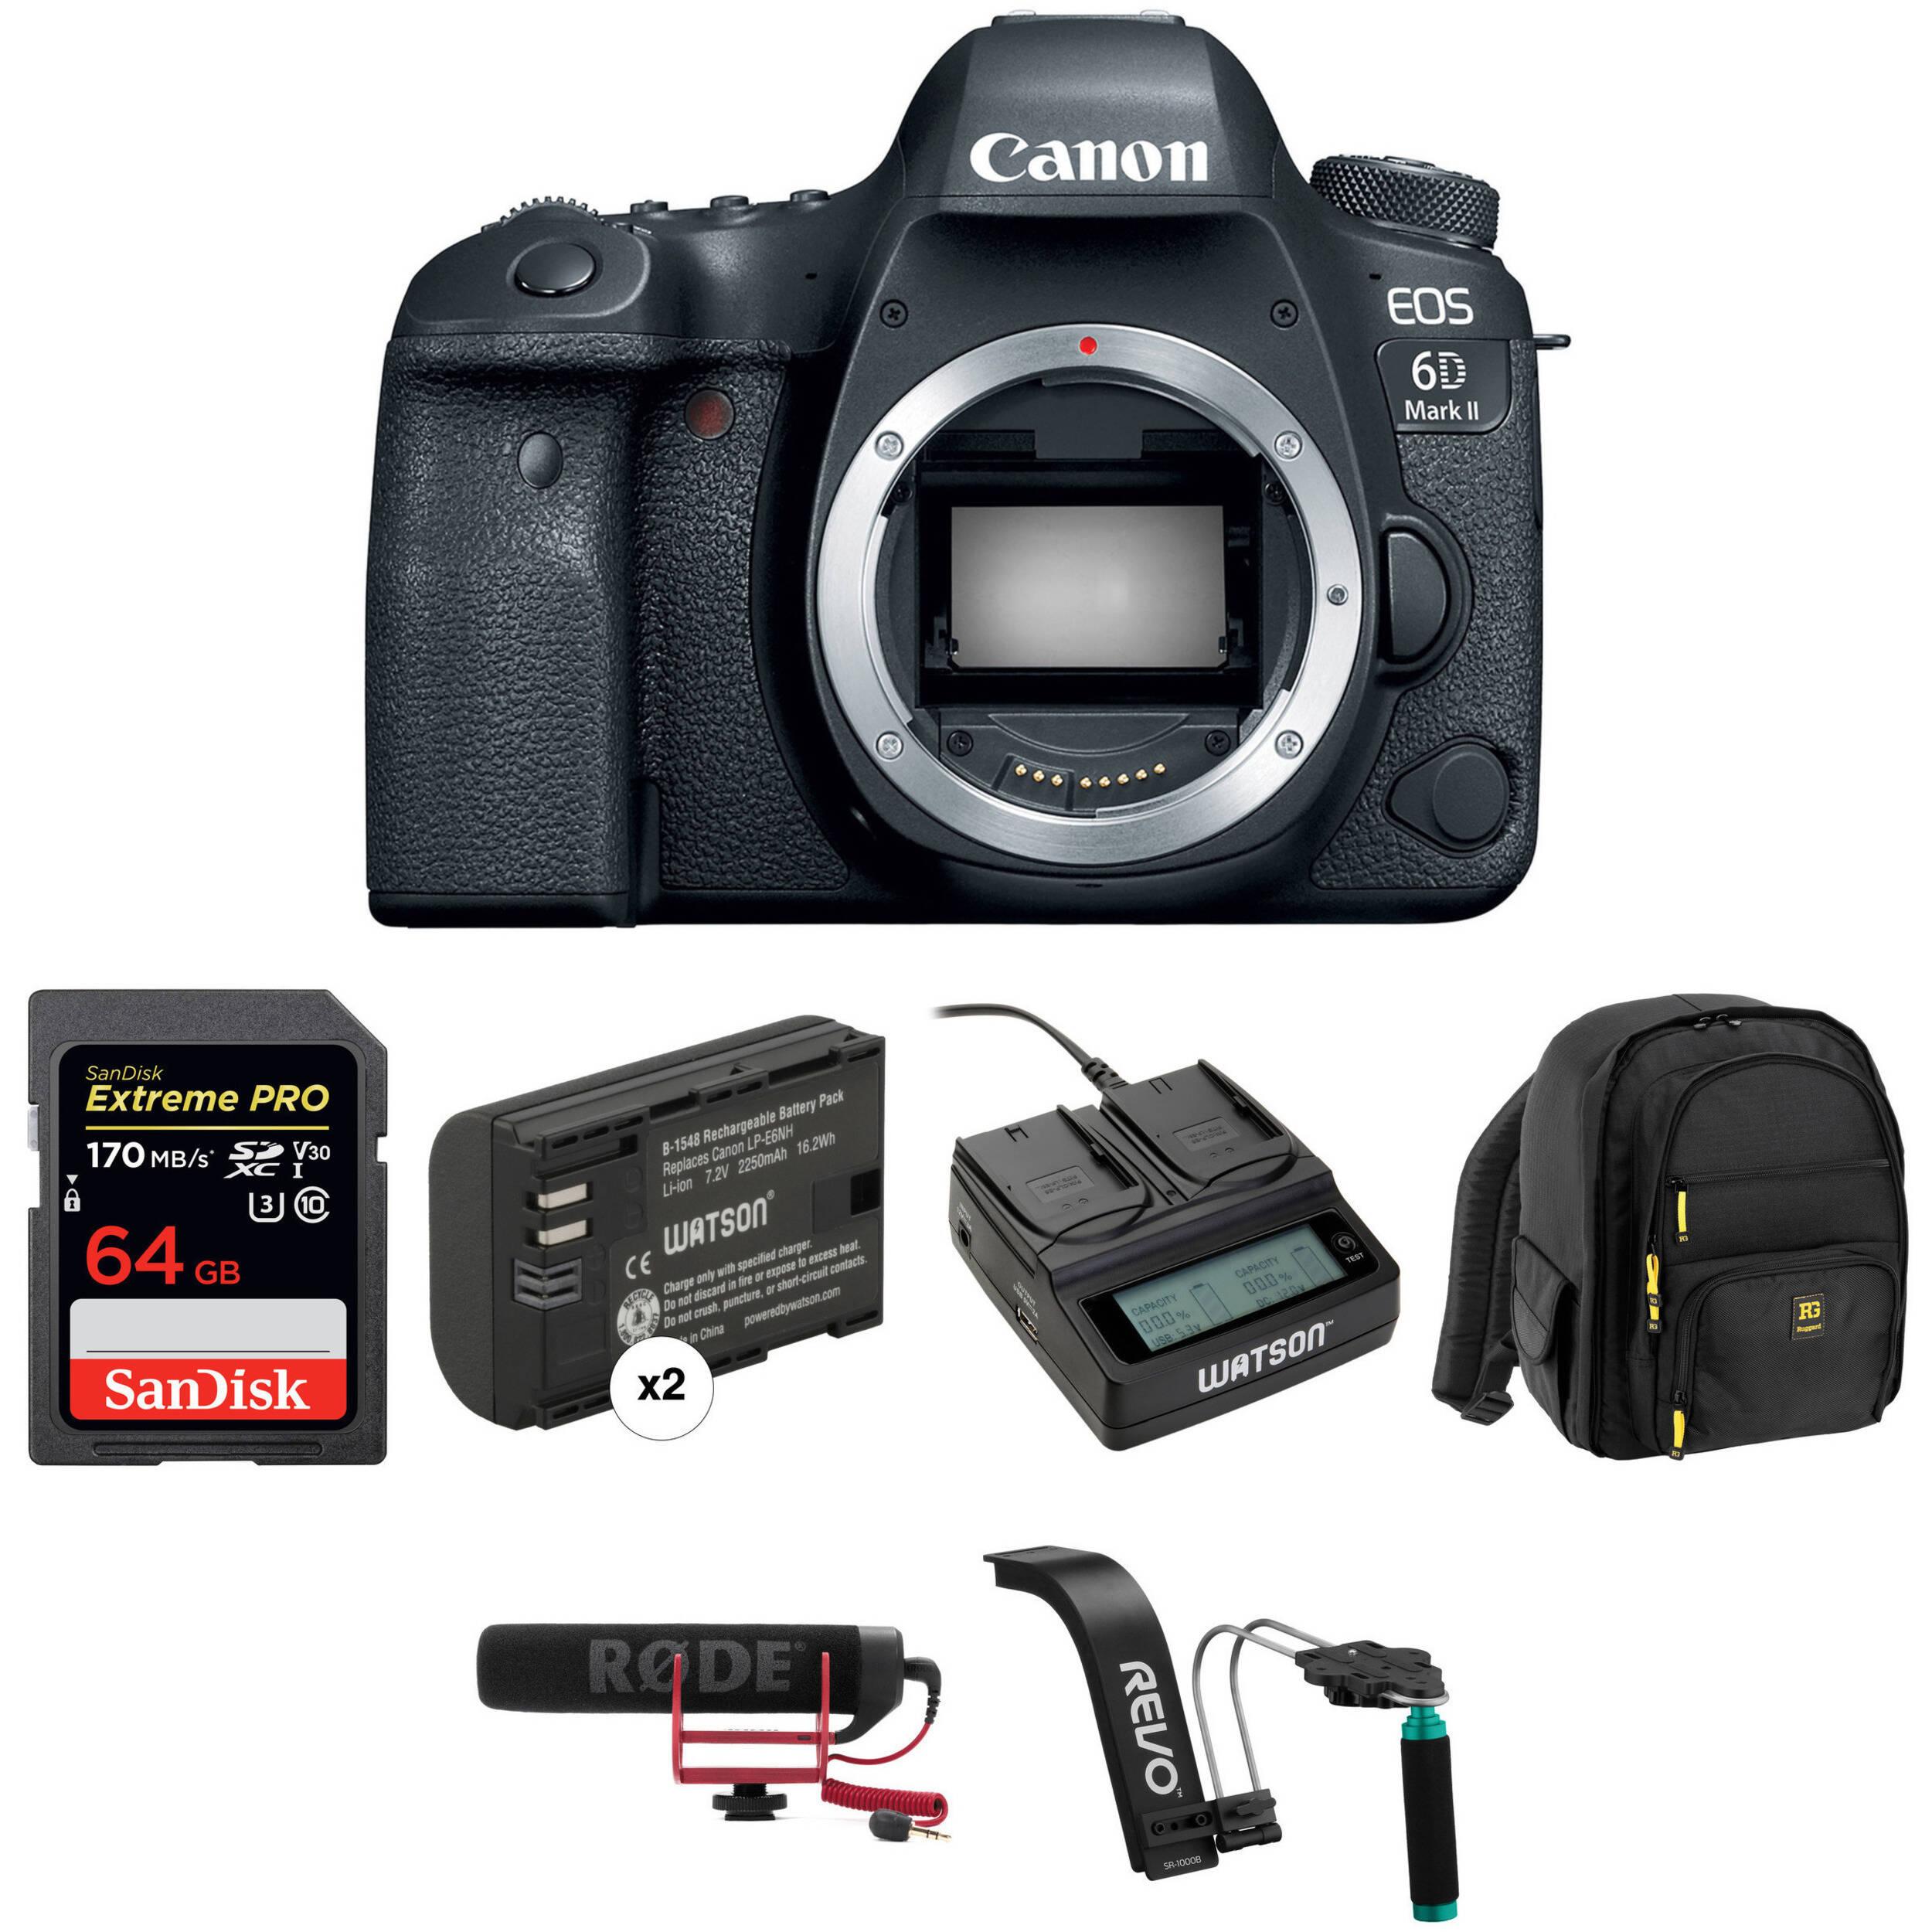 Canon Eos 6d Mark Ii Dslr Camera Body Video Kit Bh Photo Rain Water Sensor Circuit Using Ne555 And Tup2sb178